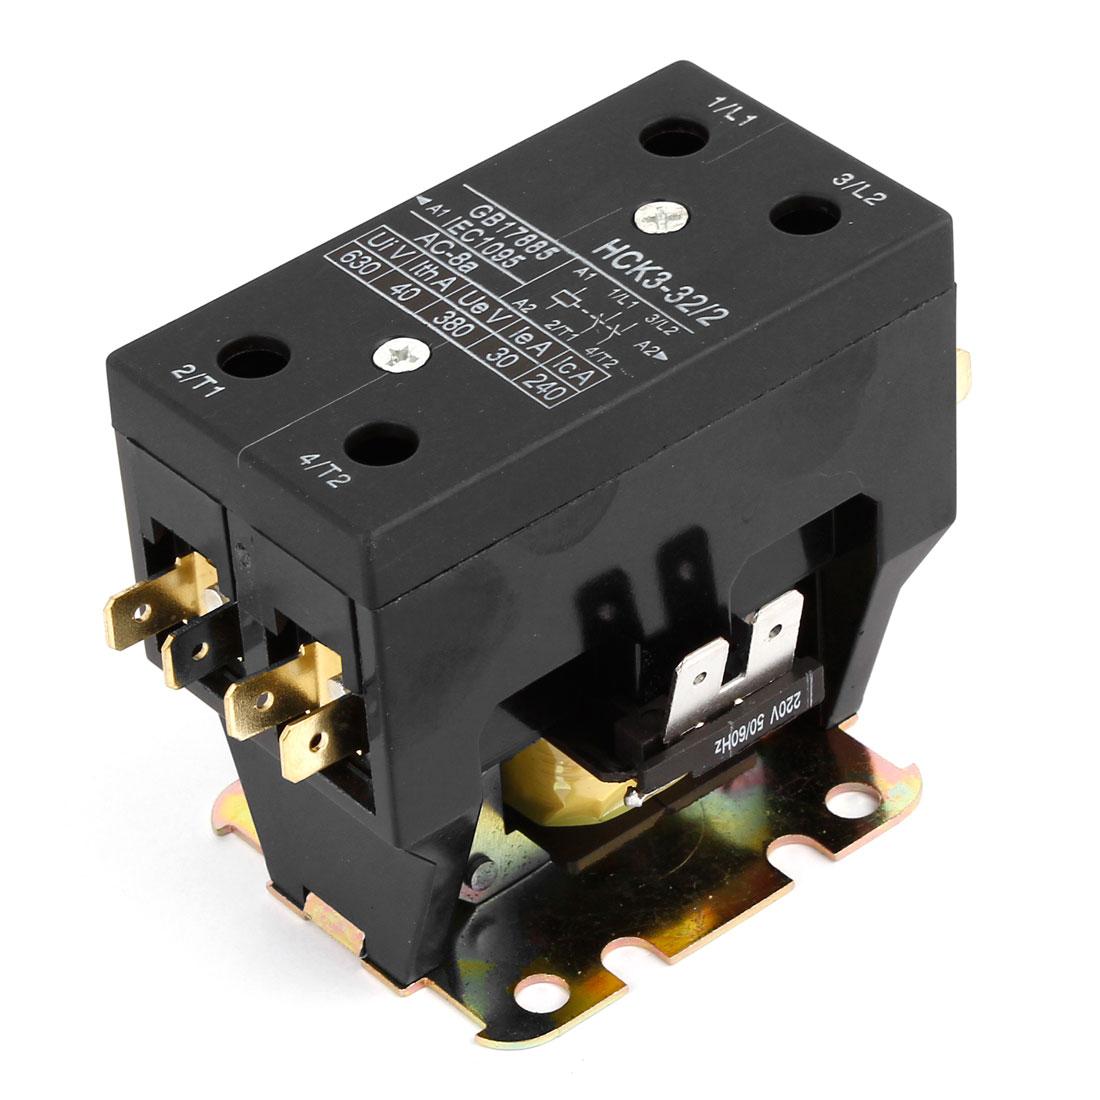 220V 630V Ui 40A Ith Coil 1PH Normal Open Air Conditioner Compressor Contactor